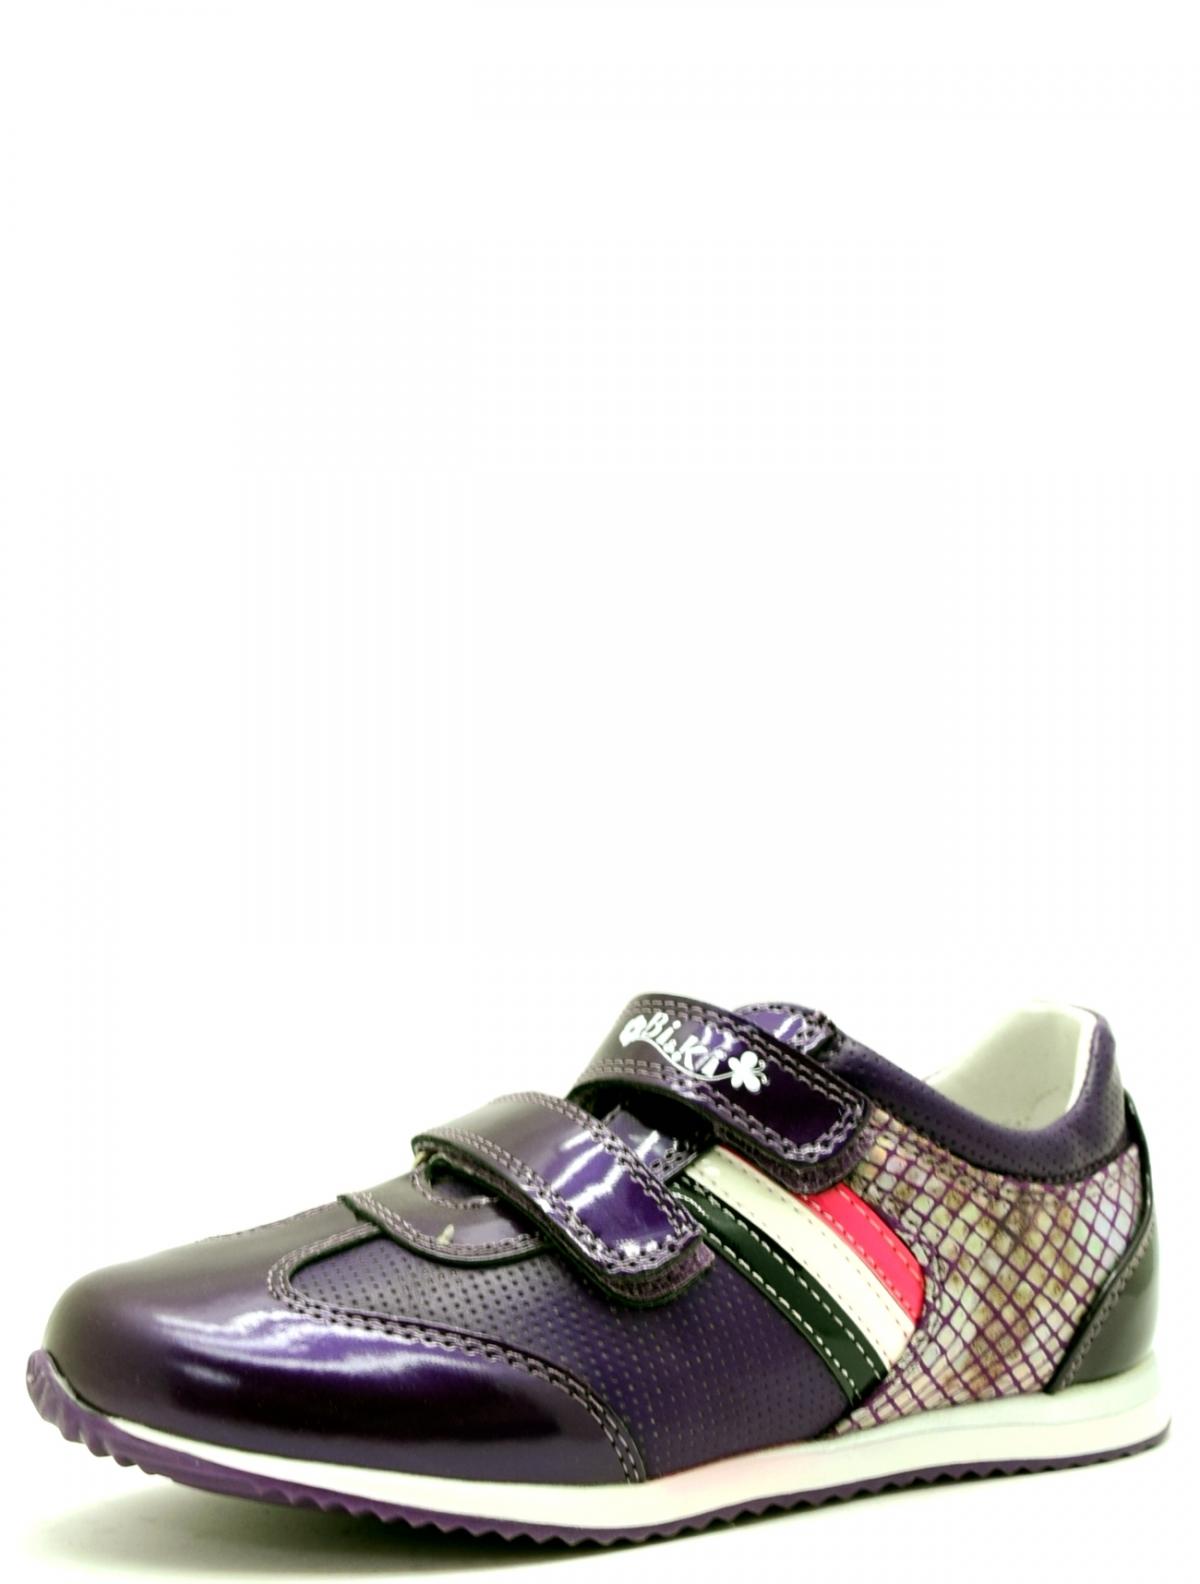 A-B02-13-D кроссовки для девочки